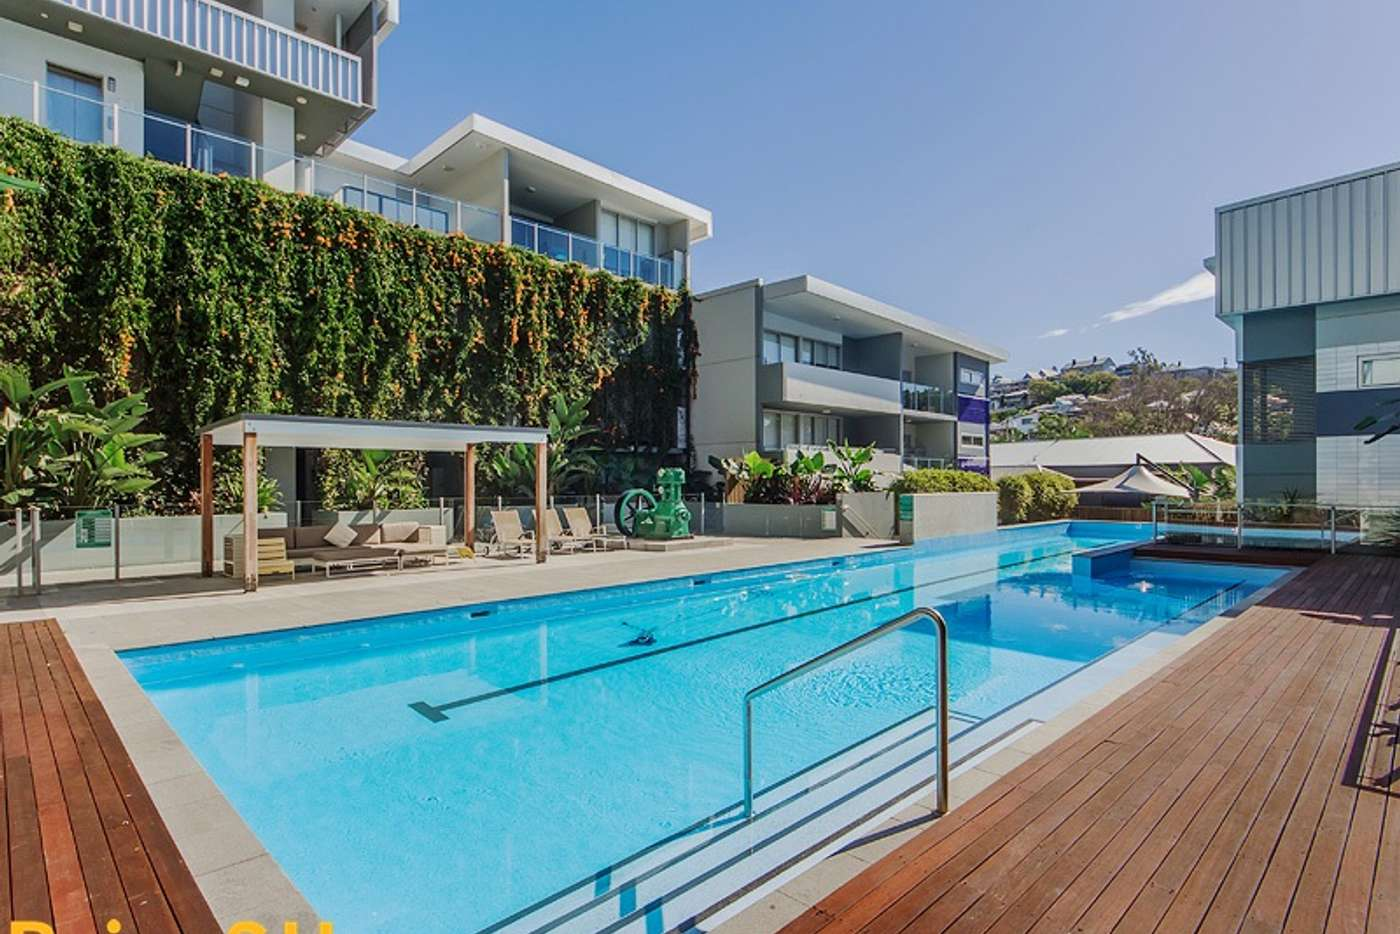 Main view of Homely apartment listing, 4/3 Alexandra Street, Paddington QLD 4064